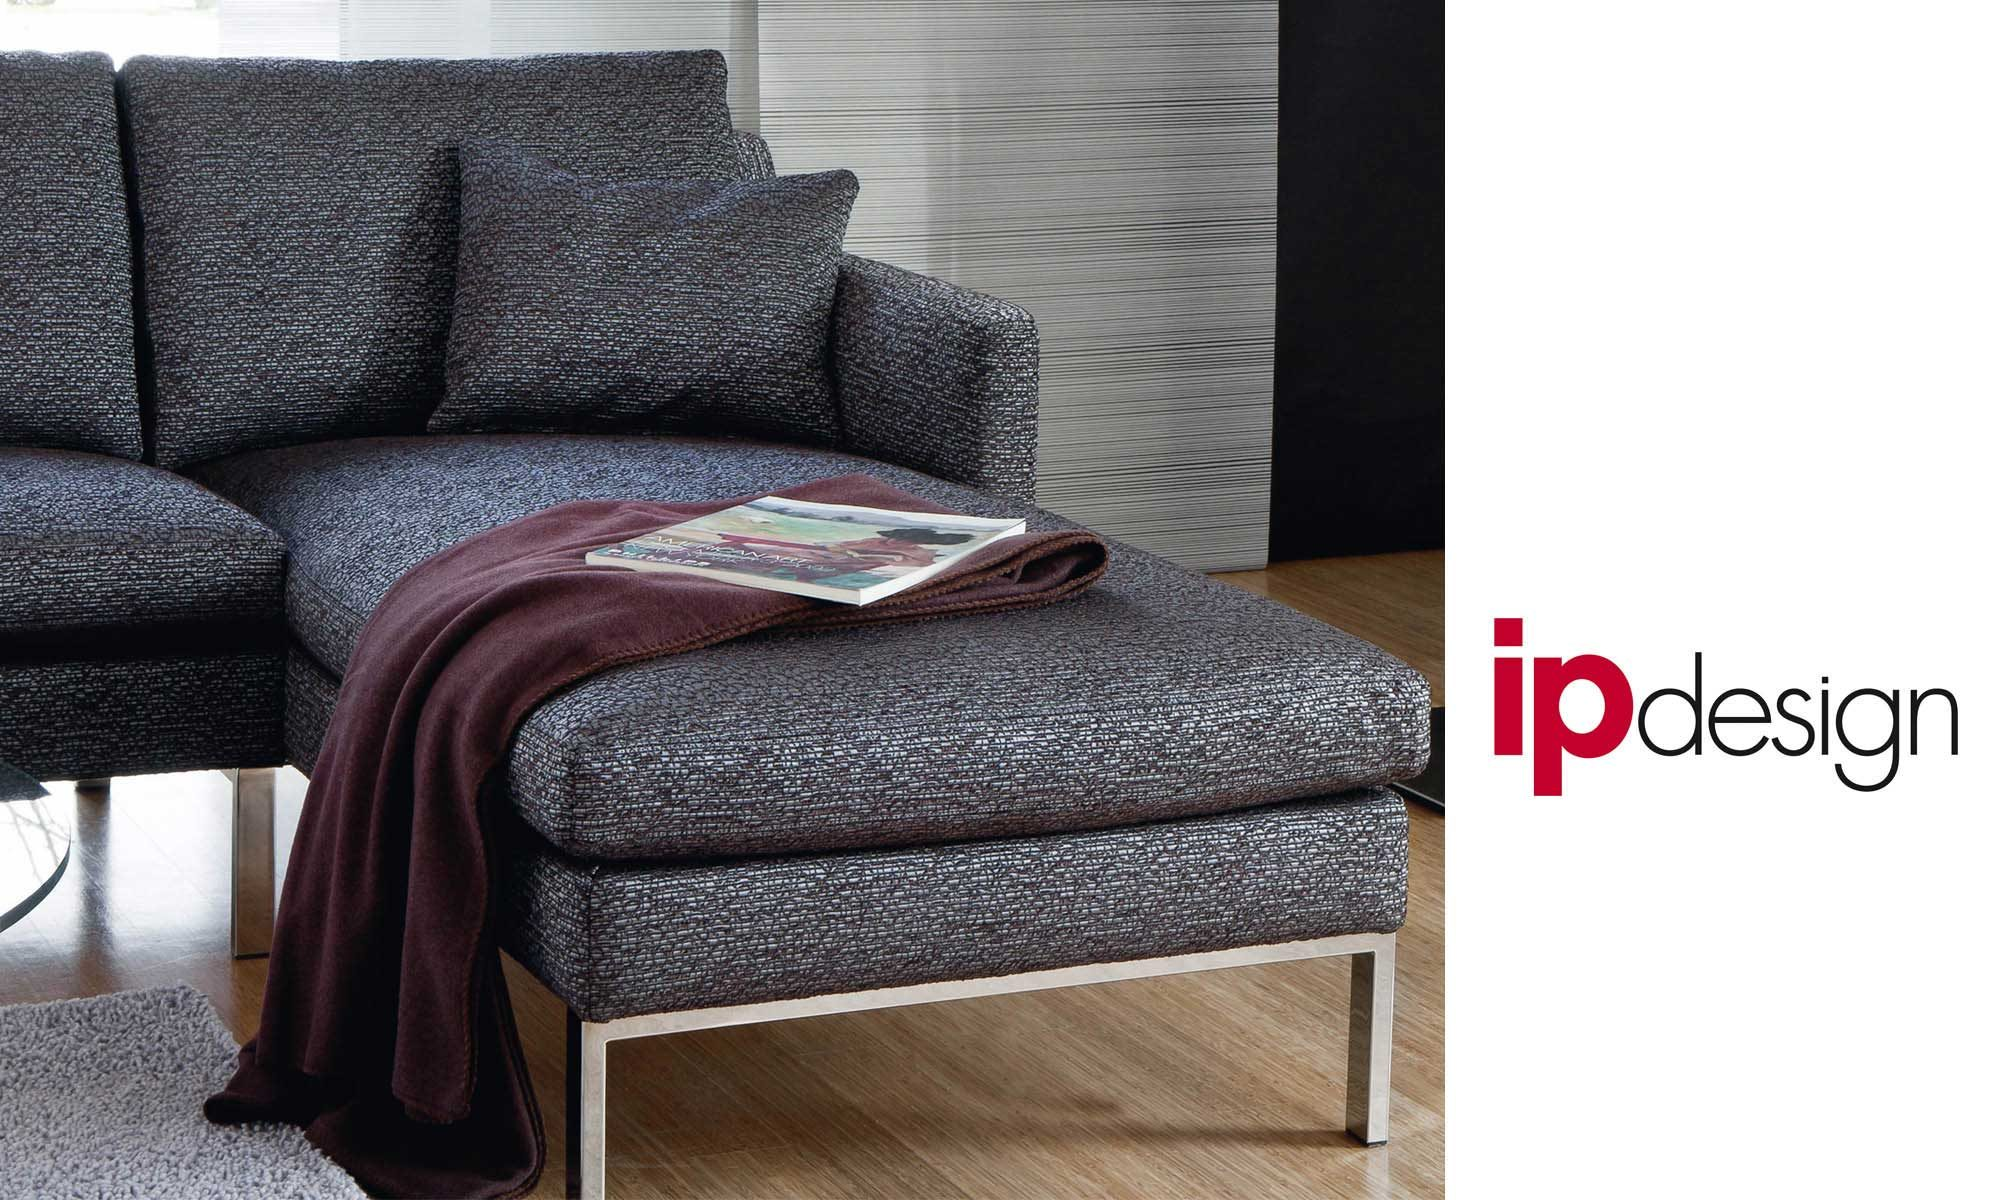 PURE ELEMENTS bodenfrei, Sofa (ipdesign)